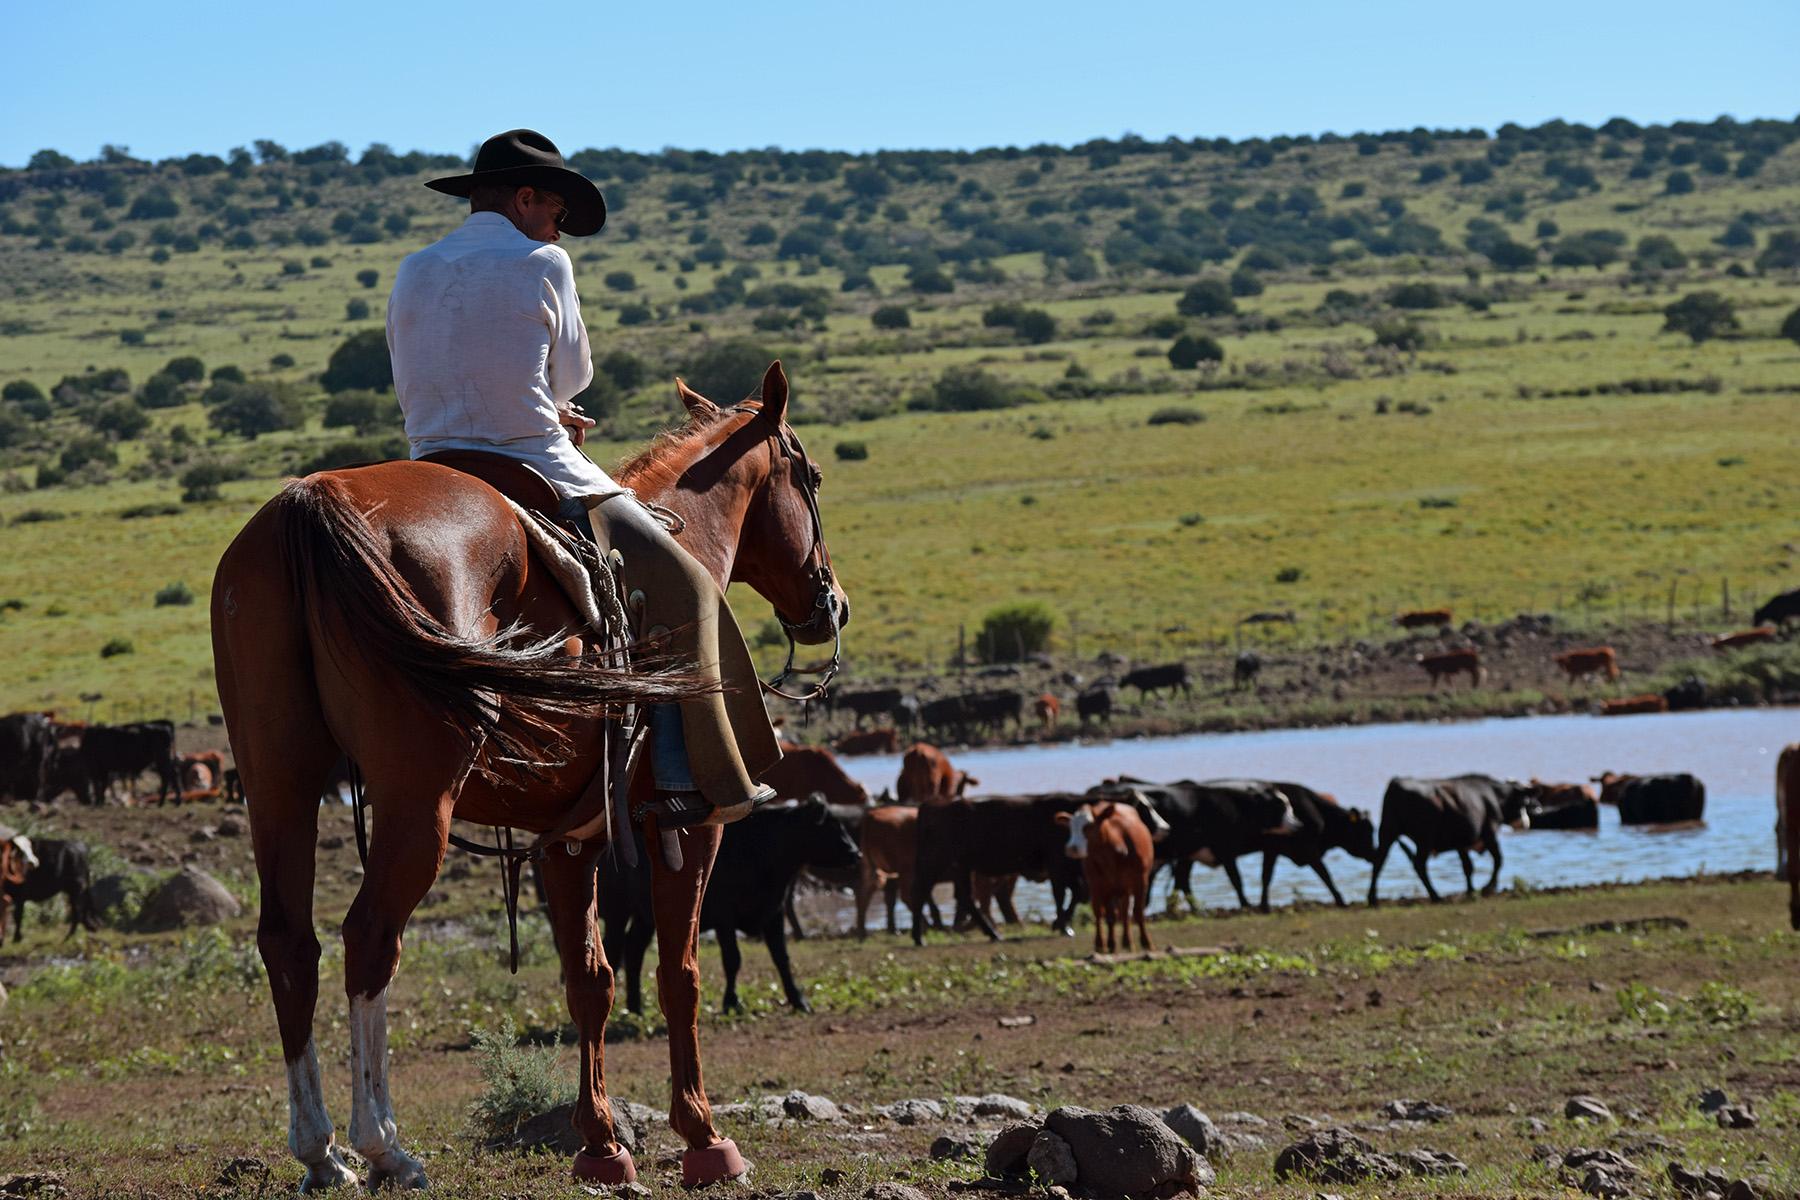 Cowboy tends cattle